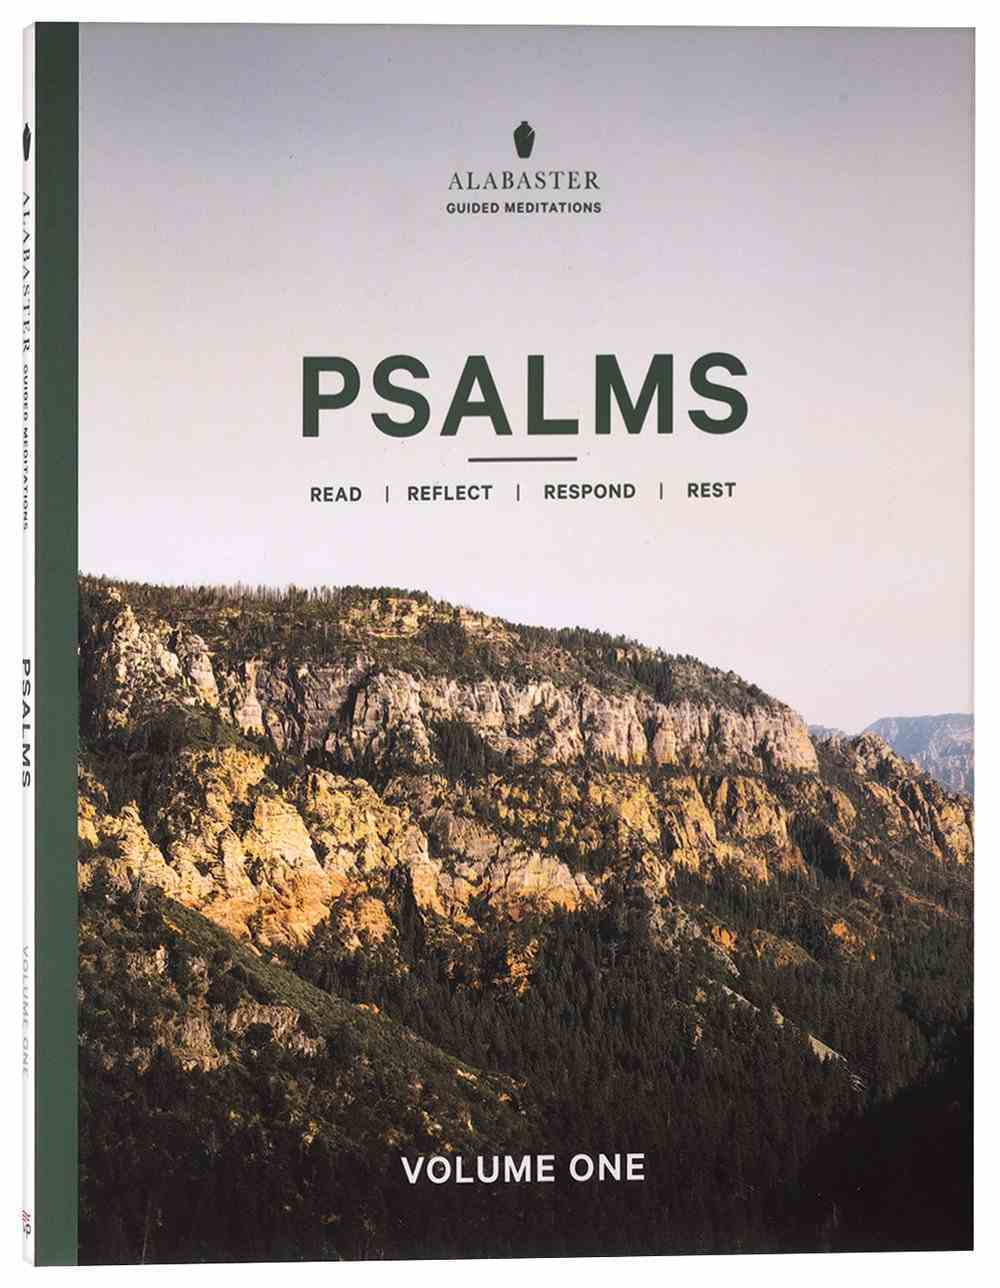 NLT Psalms 1-72 (Alabaster Guided Meditations Series) (Alabaster Guided Meditations Series) Paperback